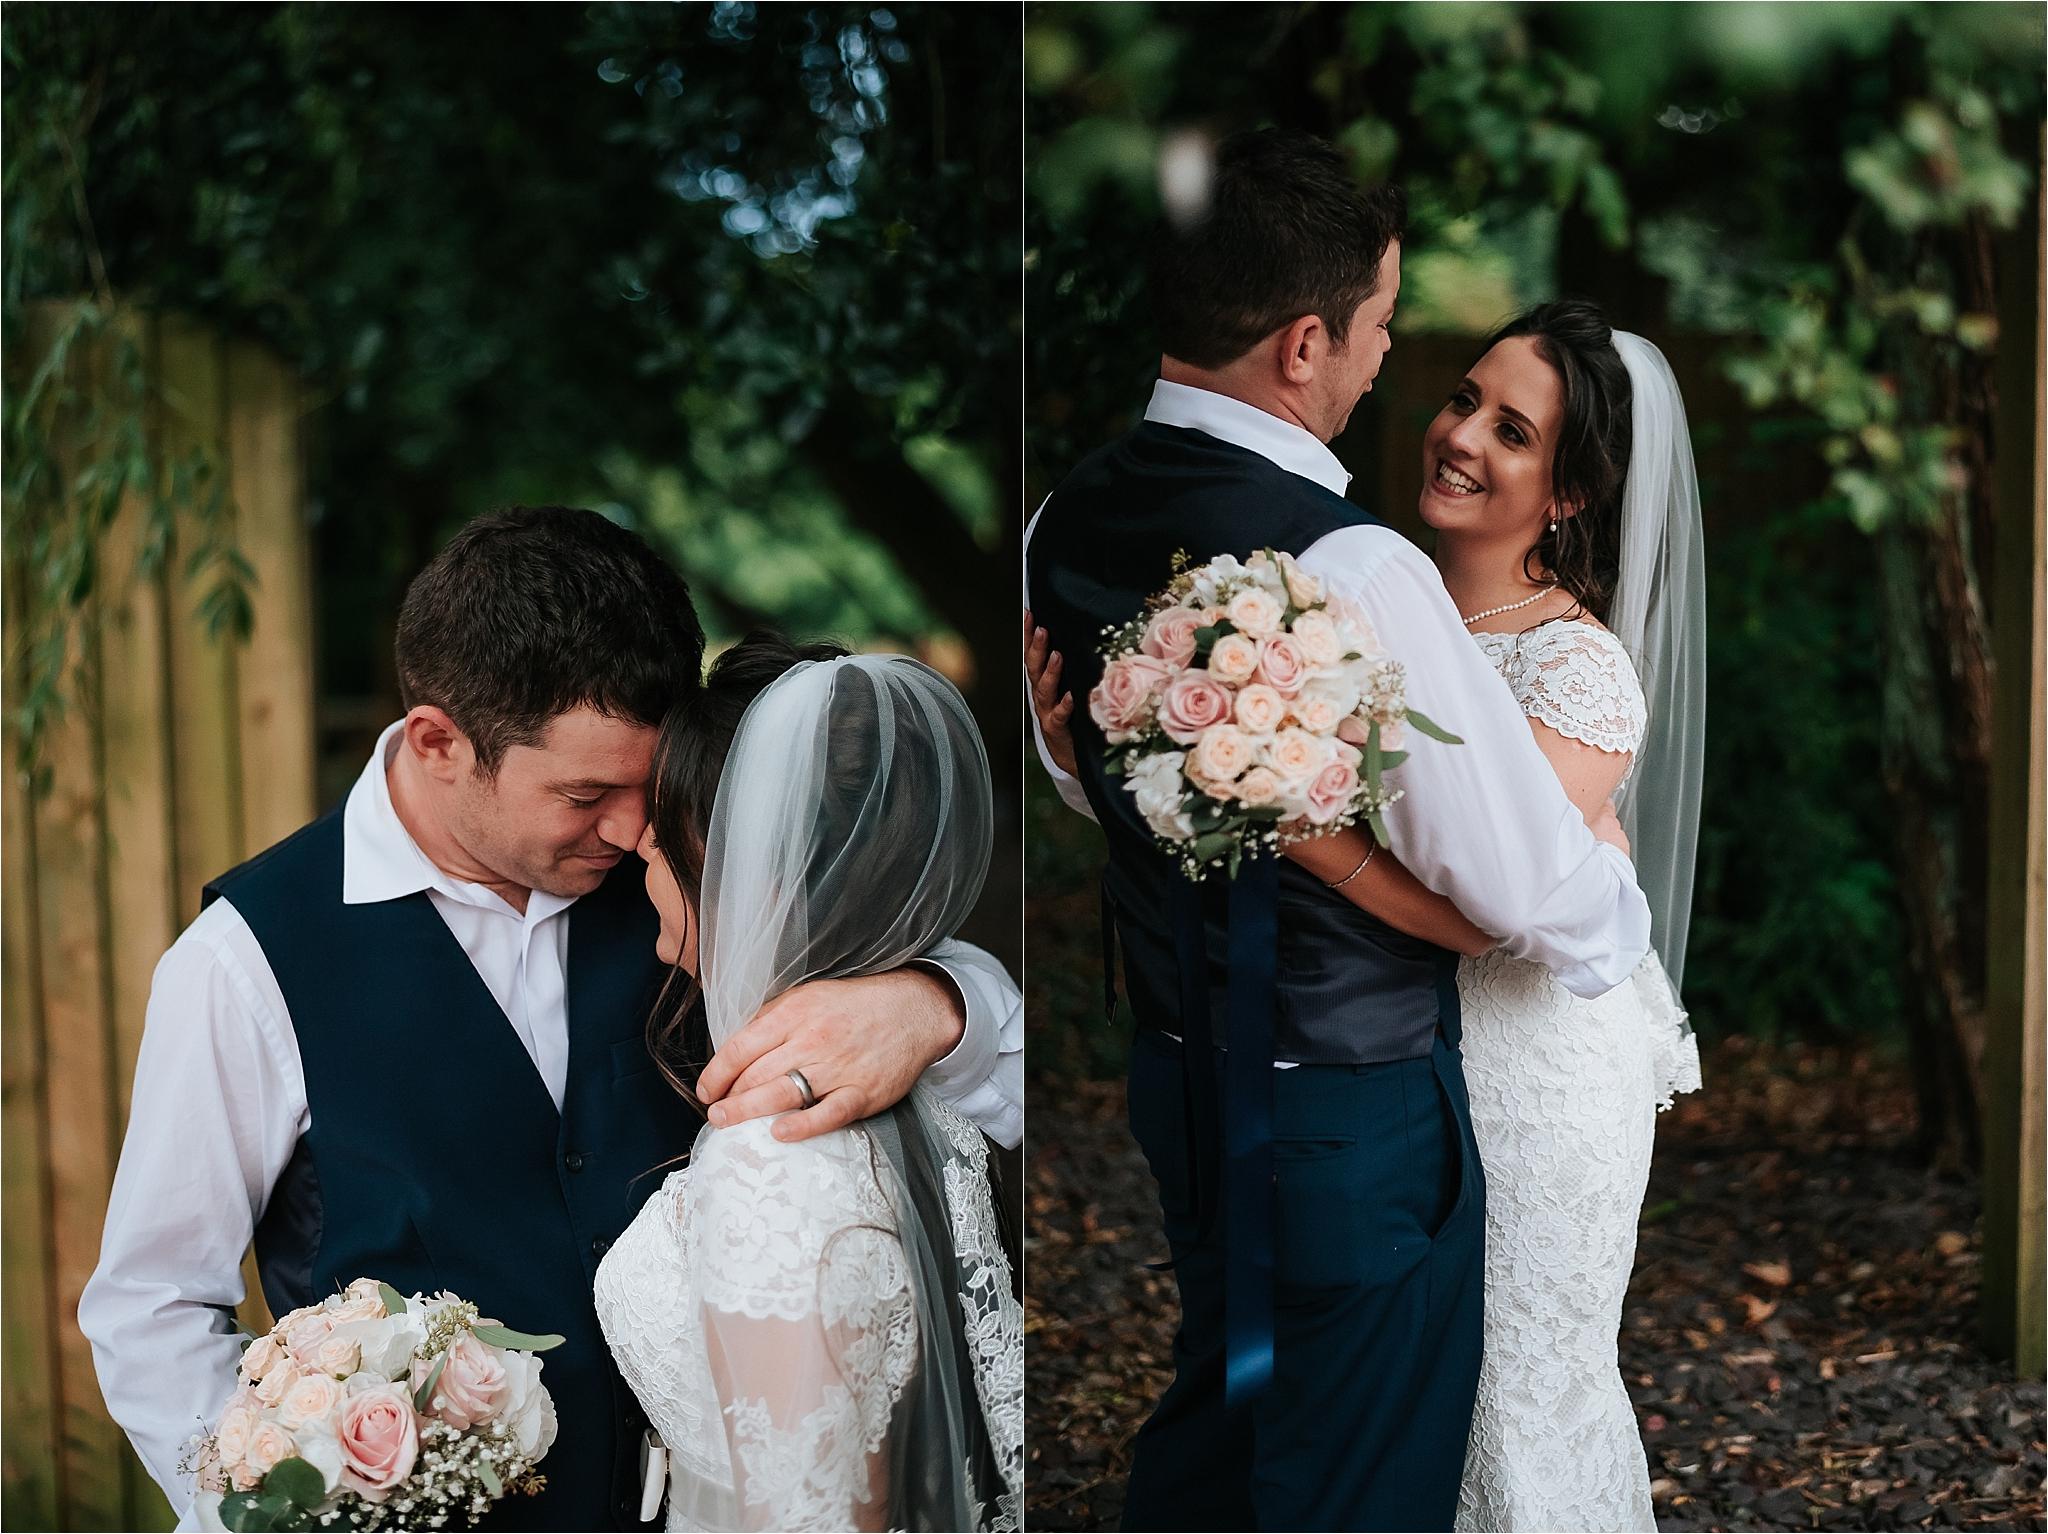 thevilla+lancashire+wreagreen+wedding+photographer64.jpg